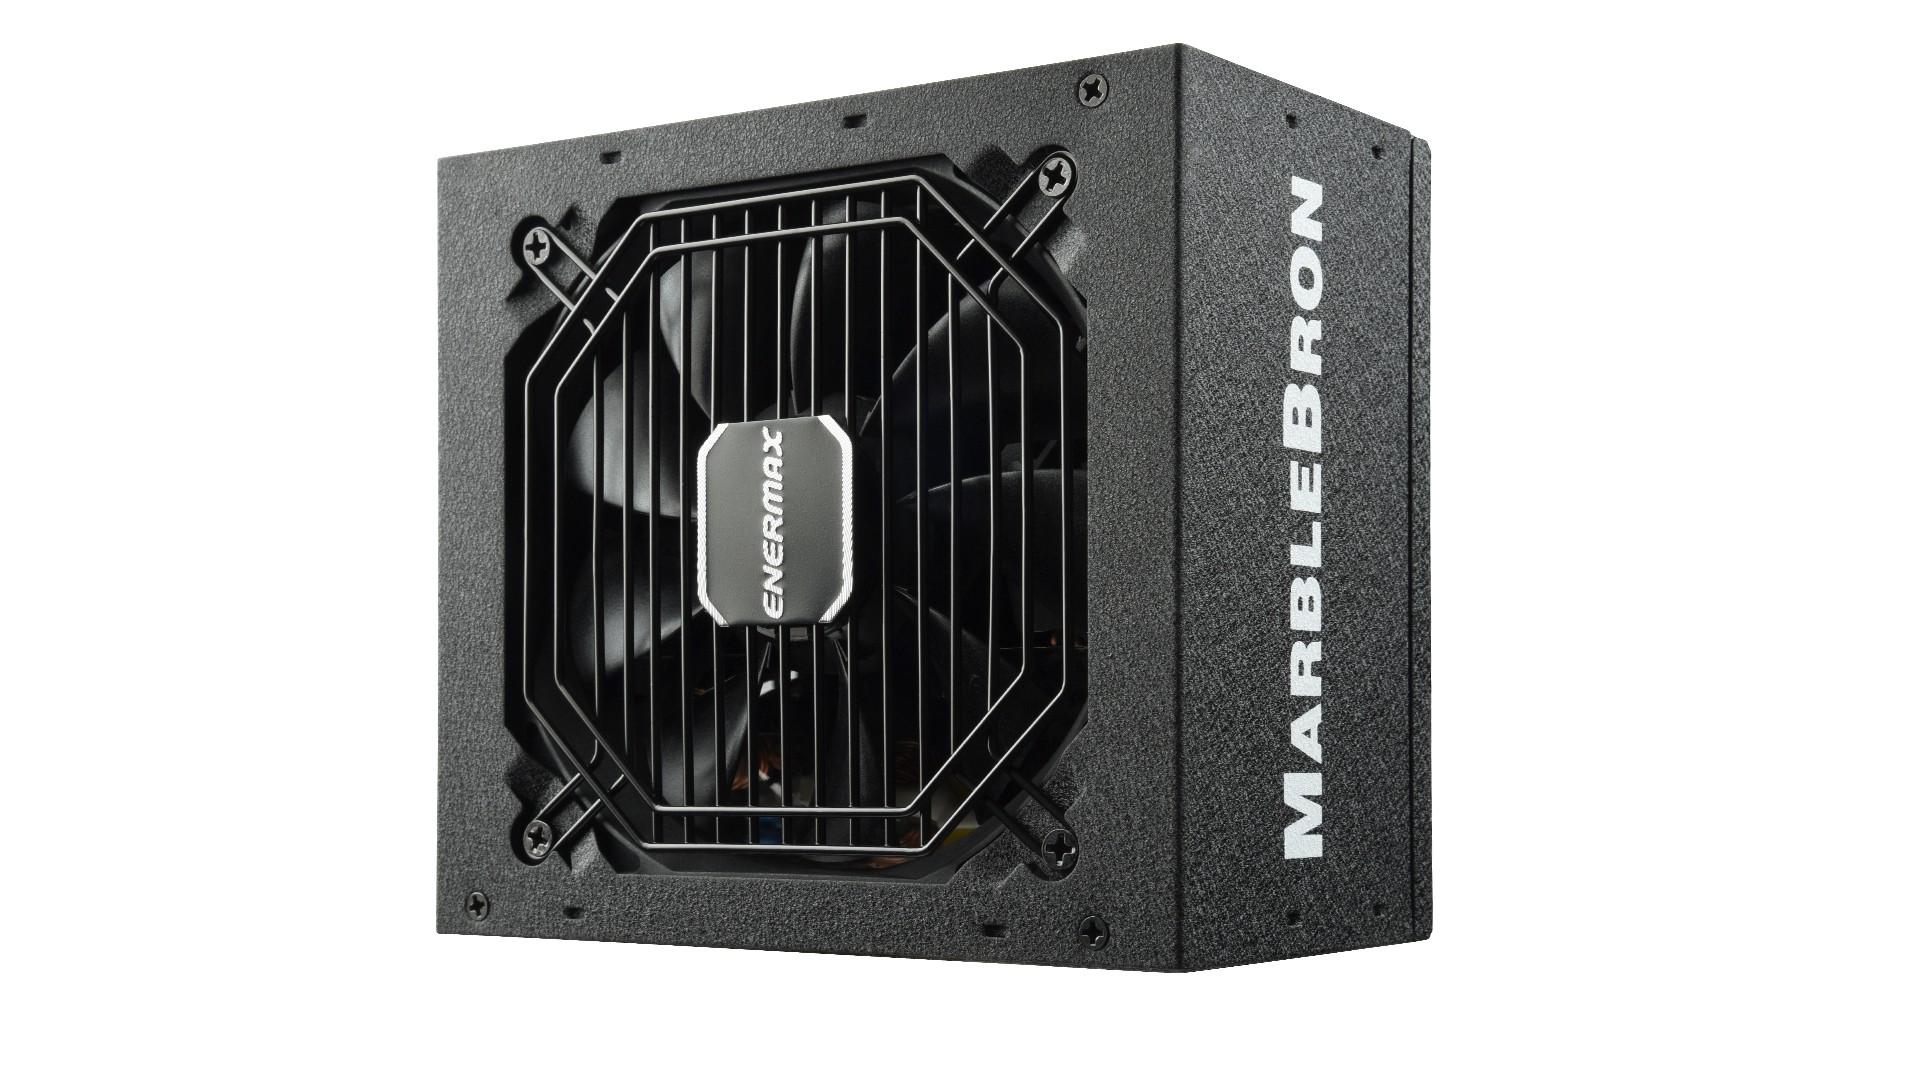 Enermax MarbleBron power supply unit 650 W 24-pin ATX ATX Zwart